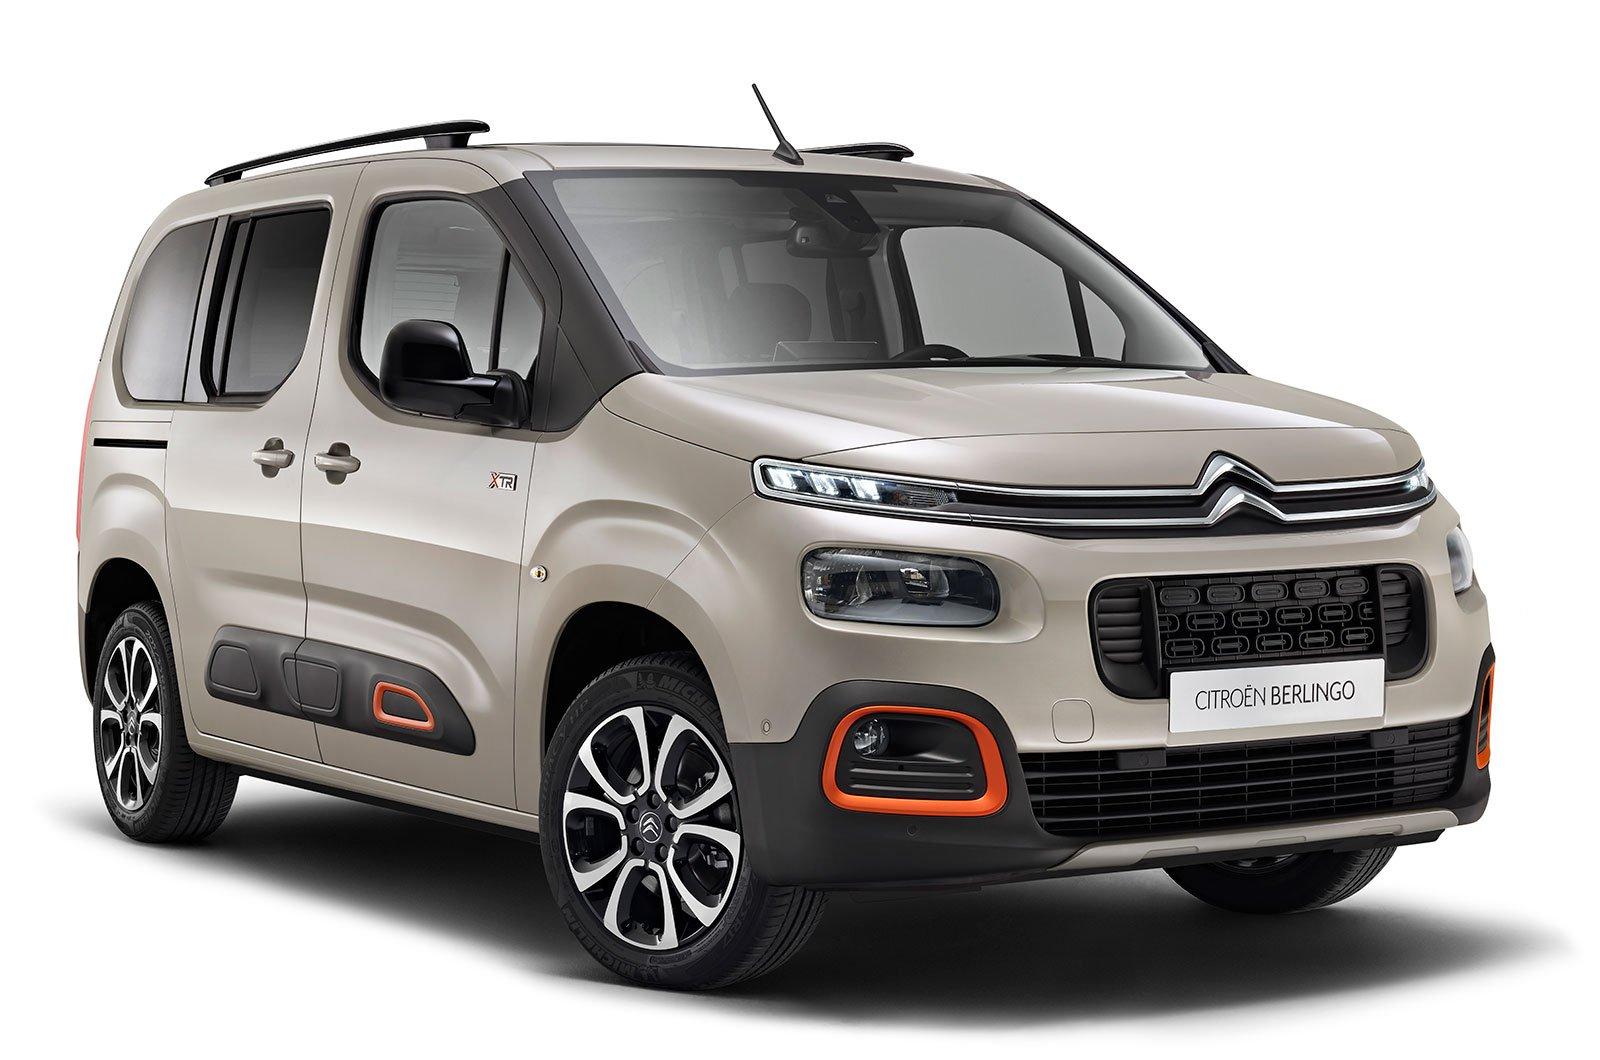 Citroën Berlingo front